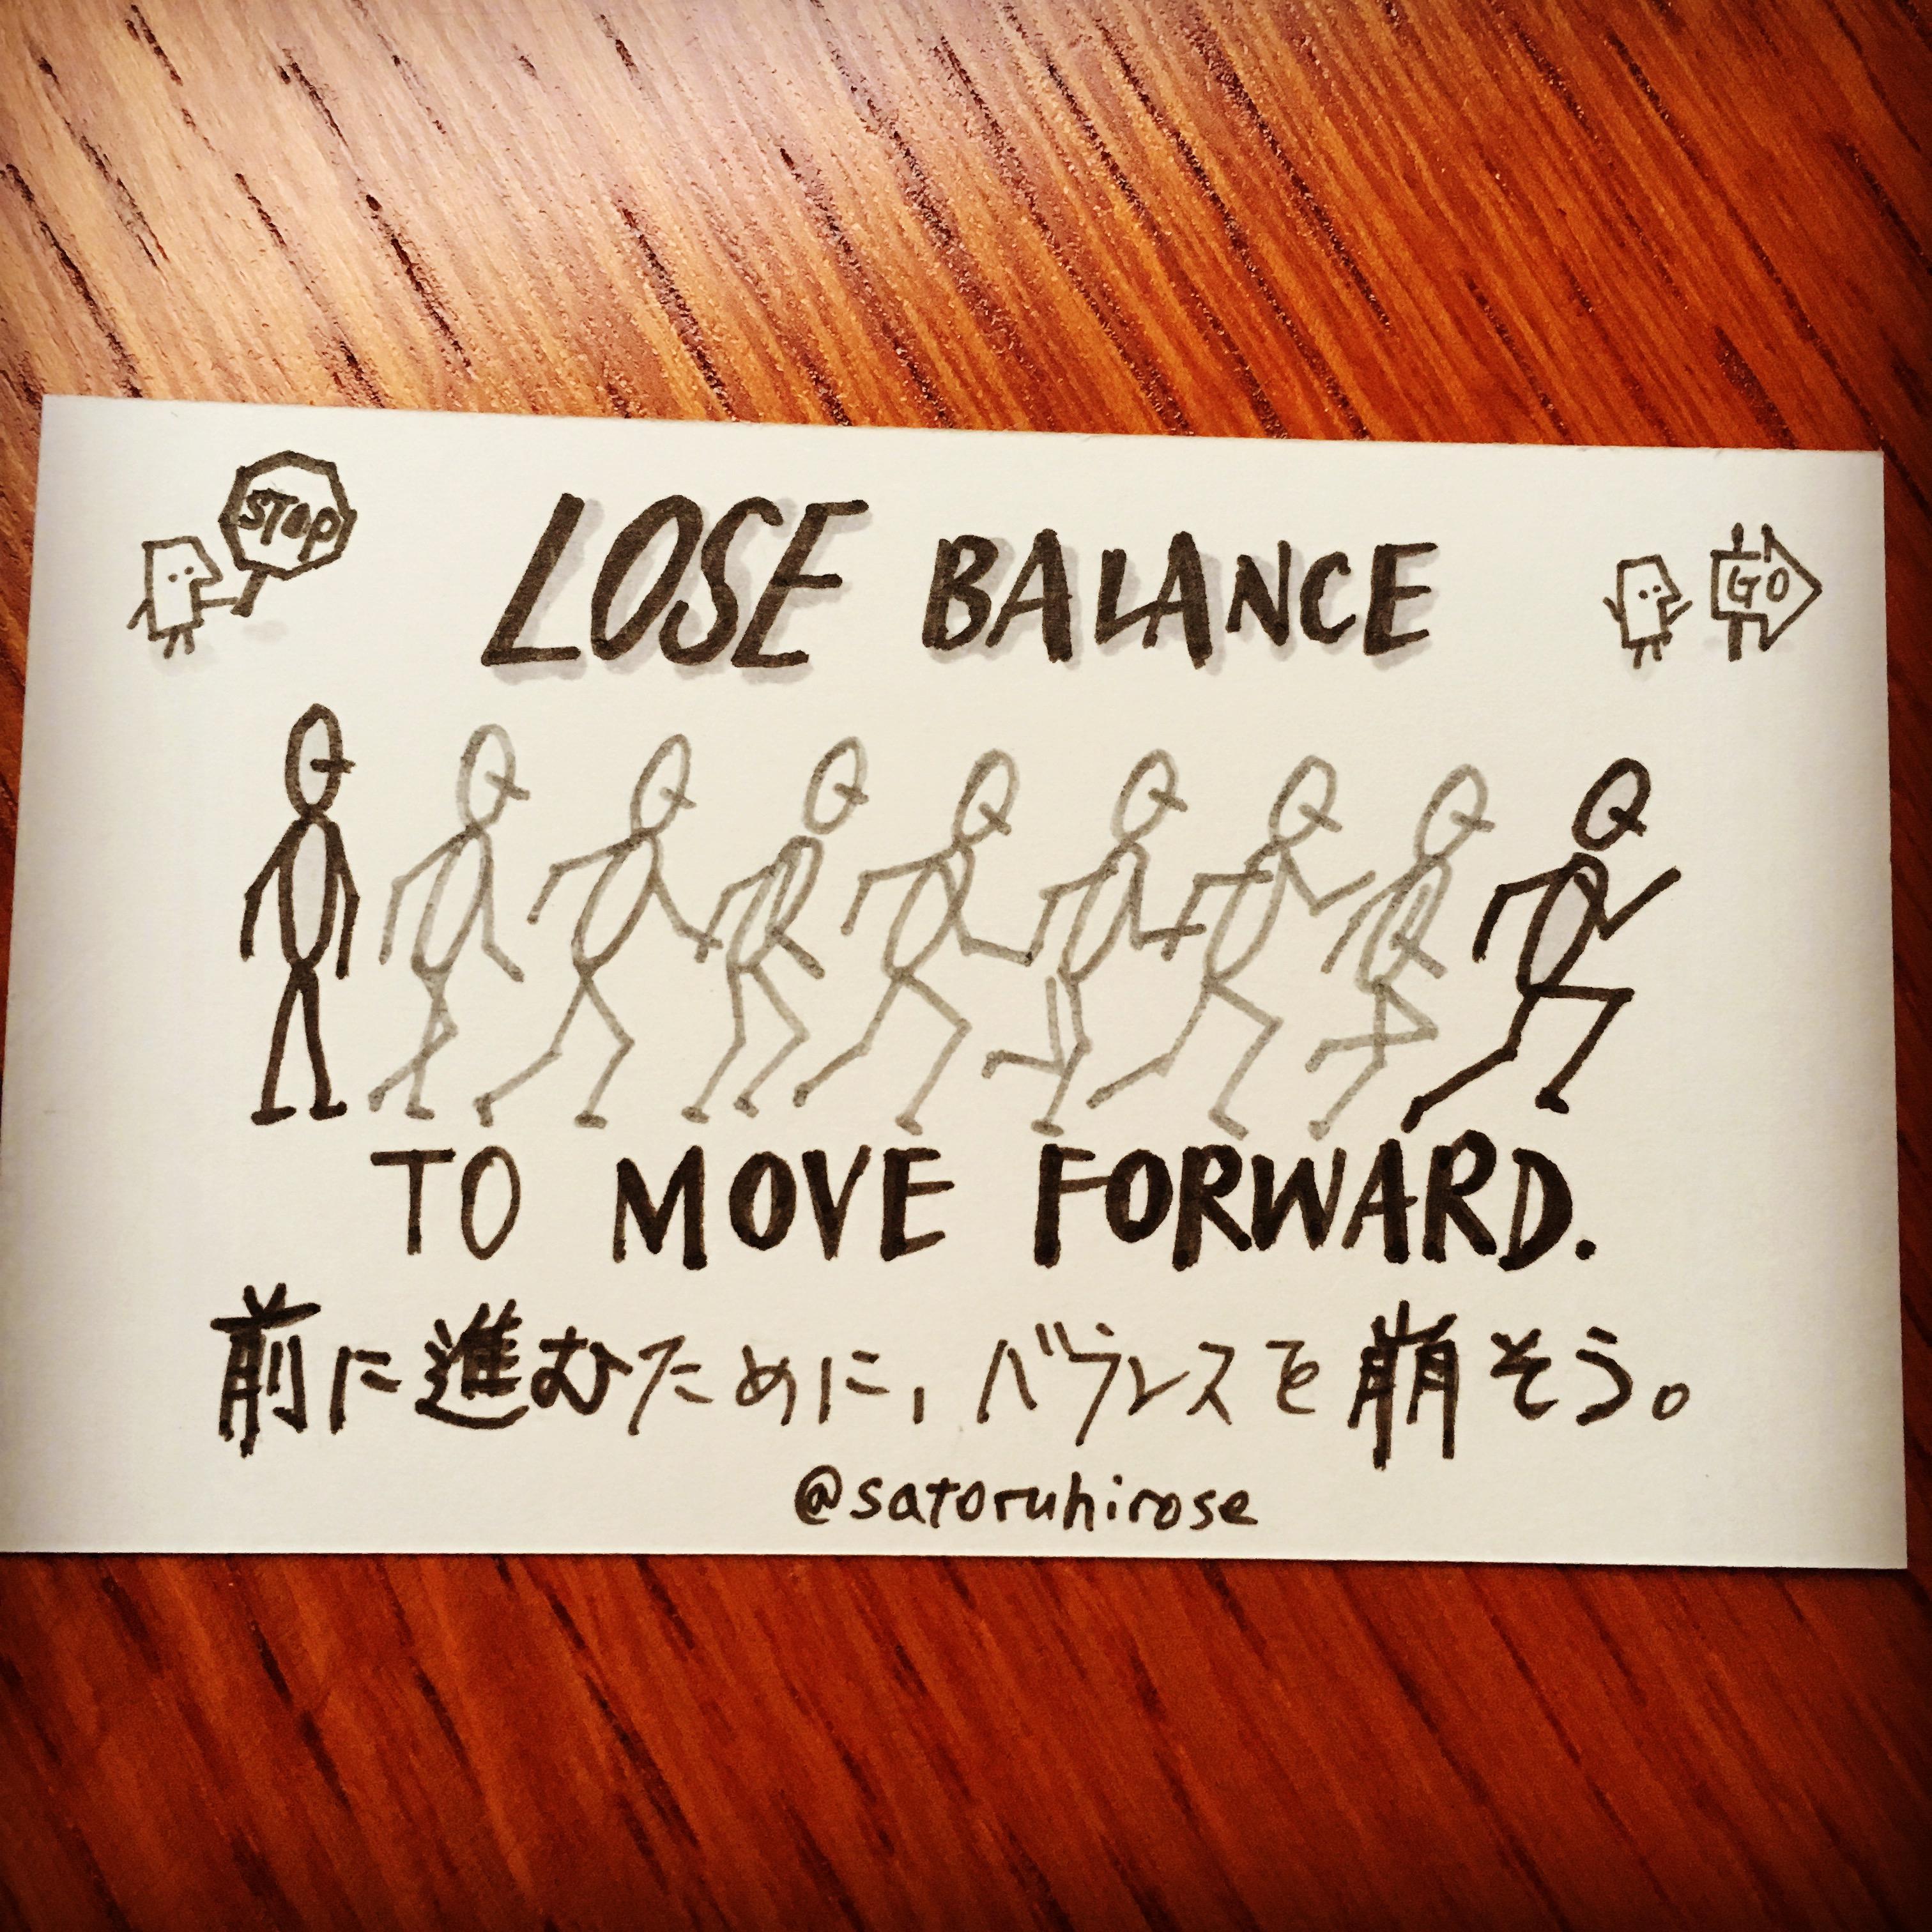 Lose balance to move forward.